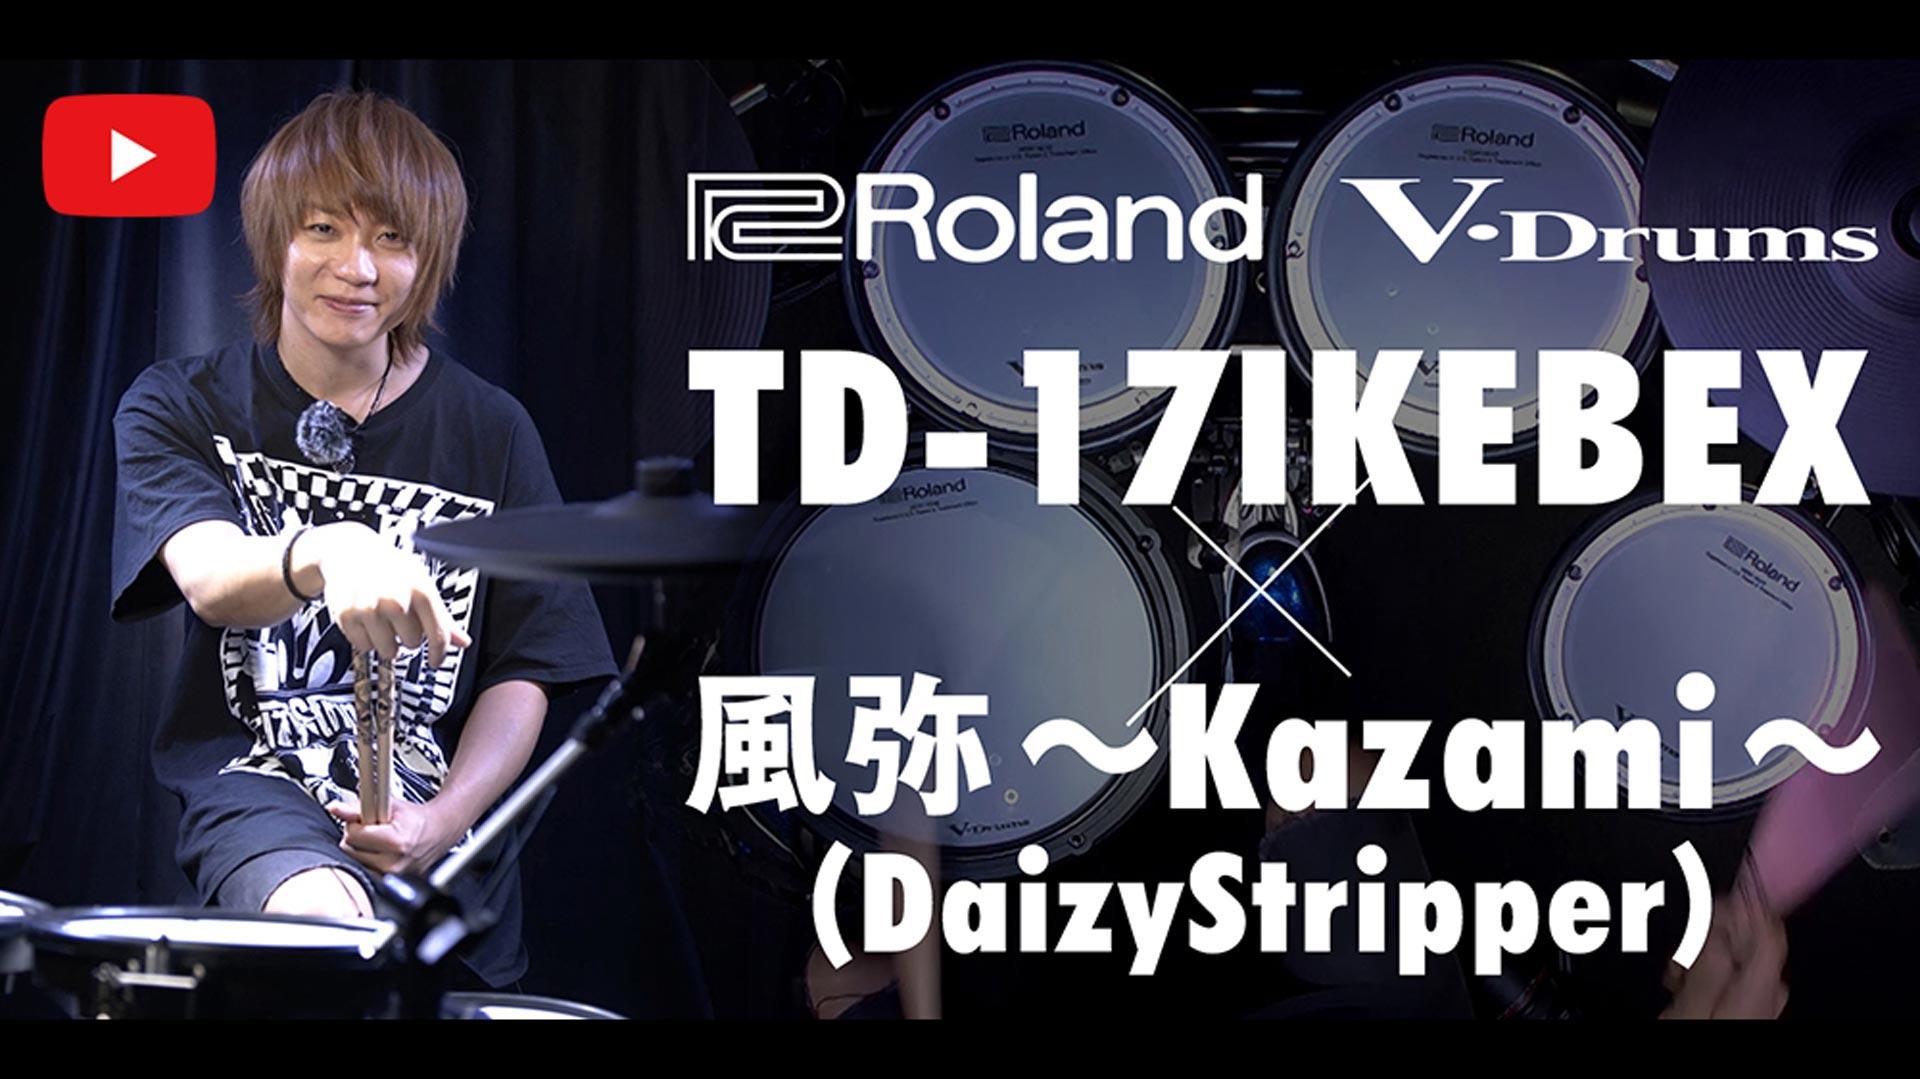 V-Drums TD-17IKEBEX×風弥~Kazami~(DaizyStripper)コラボレーション企画!| イケベ楽器店